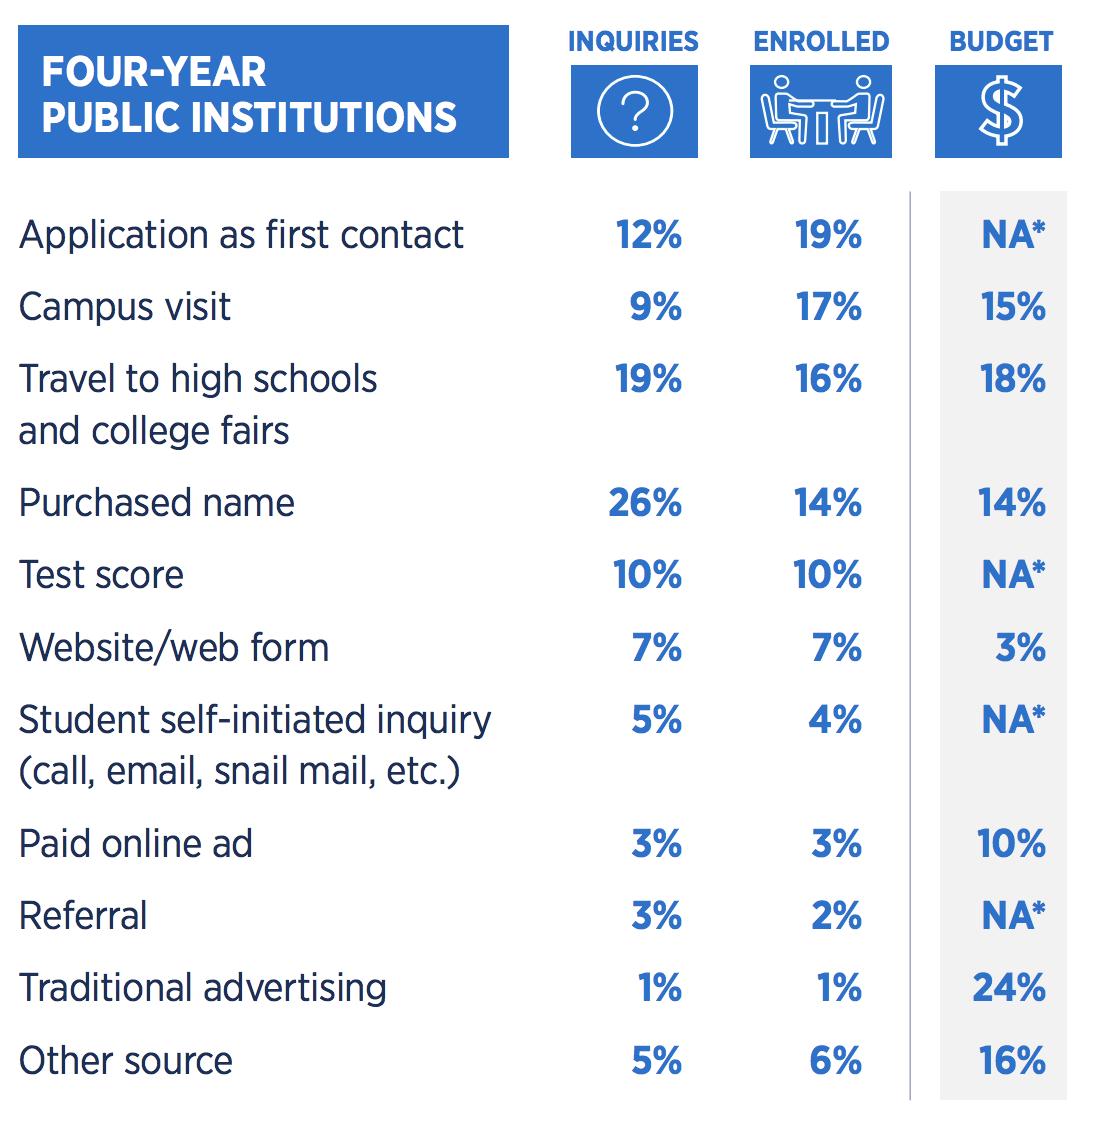 4 year institution student recruitment statistics